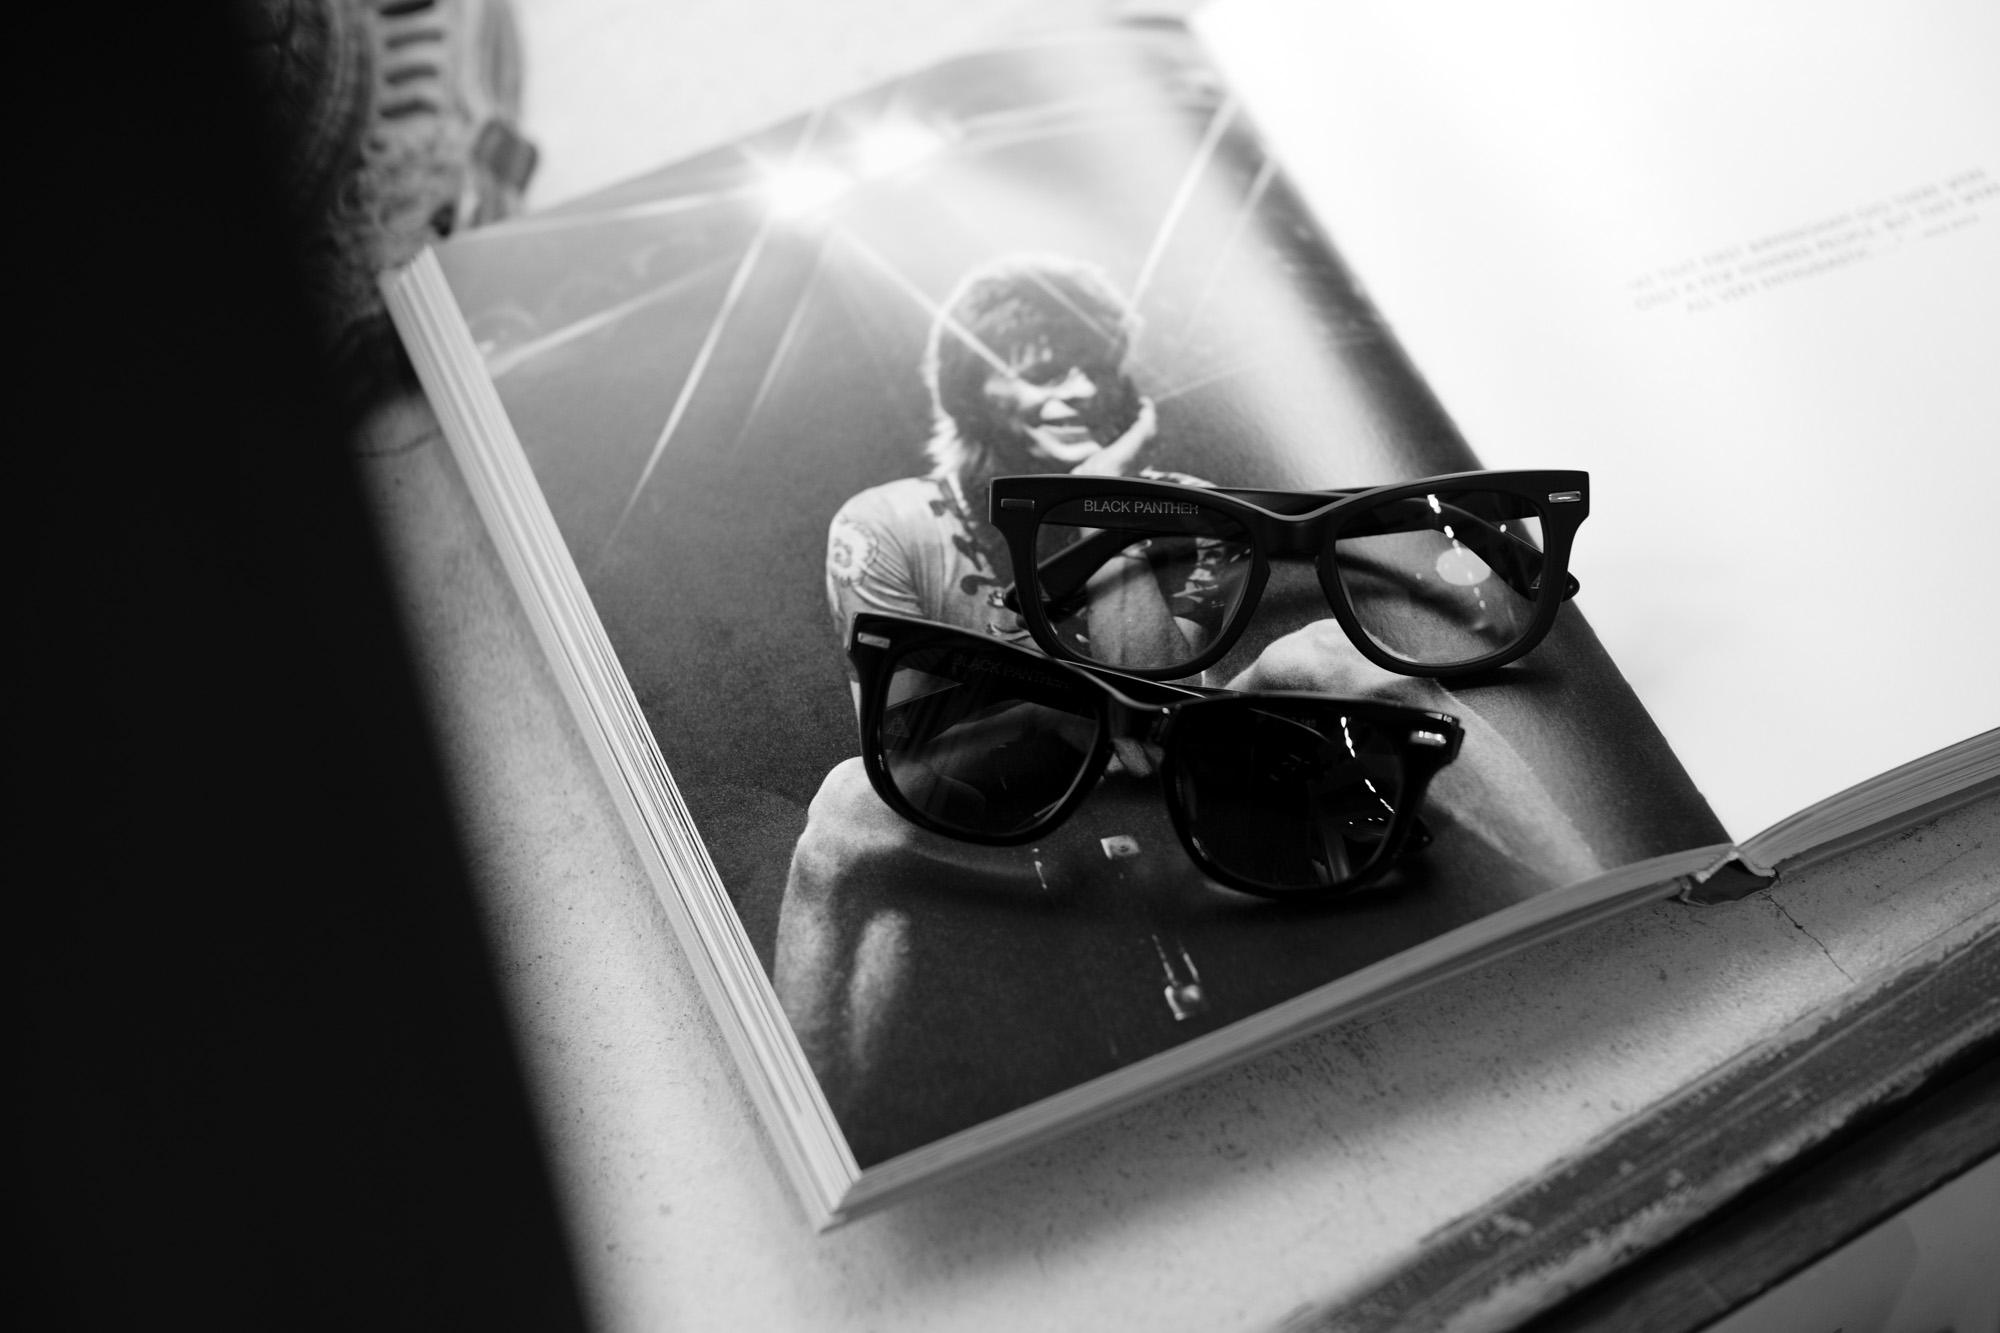 FIXER BLACK PANTHER 18K GOLD サングラス MATTE BLACK × LIGHT GRAY /// FIXER BLACK PANTHER 18K GOLD サングラス BLACK × BLACK SMOKE 【Special Model】 フィクサー ブラックパンサー 18Kゴールド マットブラック ライトグレー ブラック ブラックスモーク 愛知 名古屋 Alto e Diritto altoediritto アルトエデリット